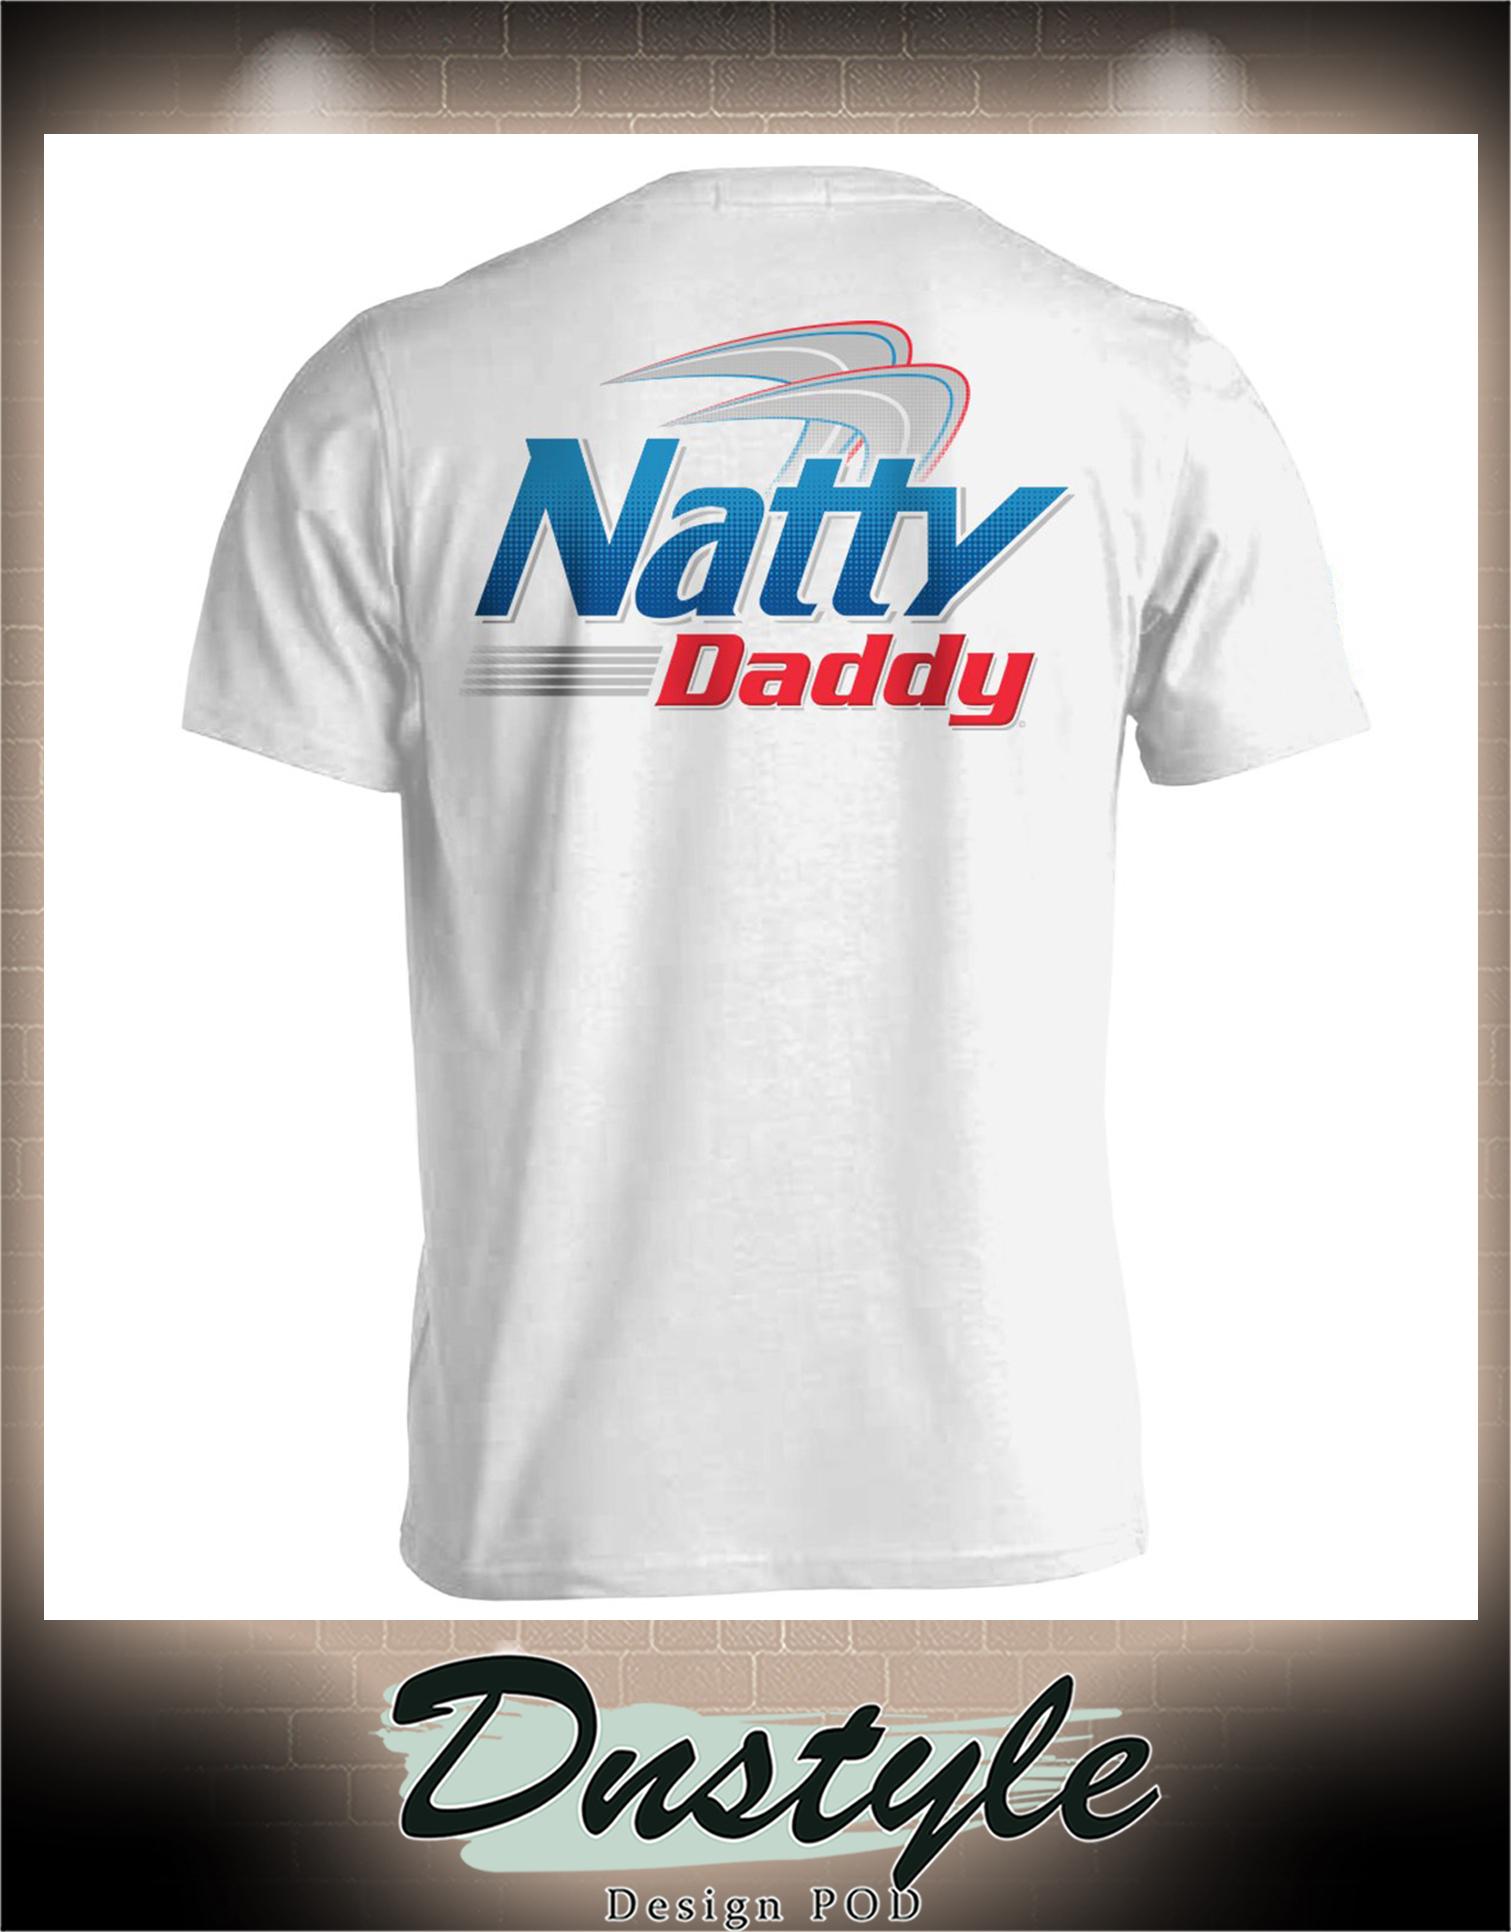 Natural light beer Natty daddy shirt